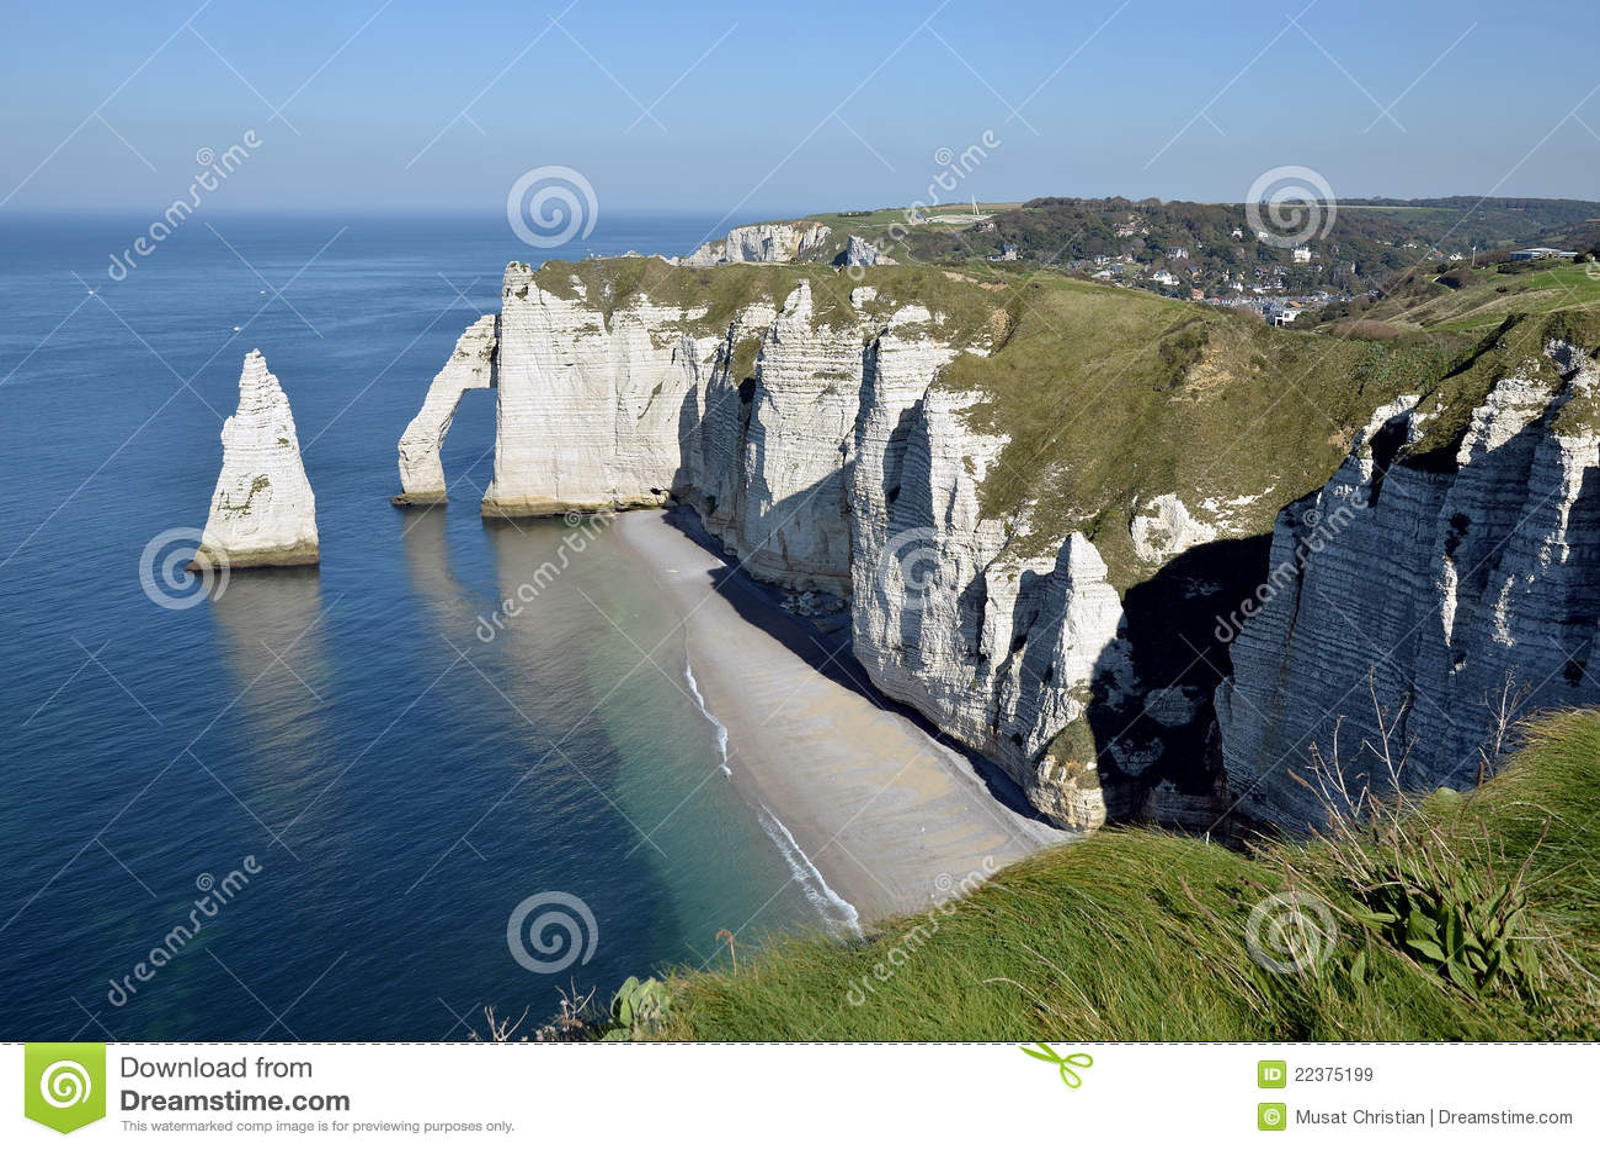 Acantilados famosos de Etretat en Francia